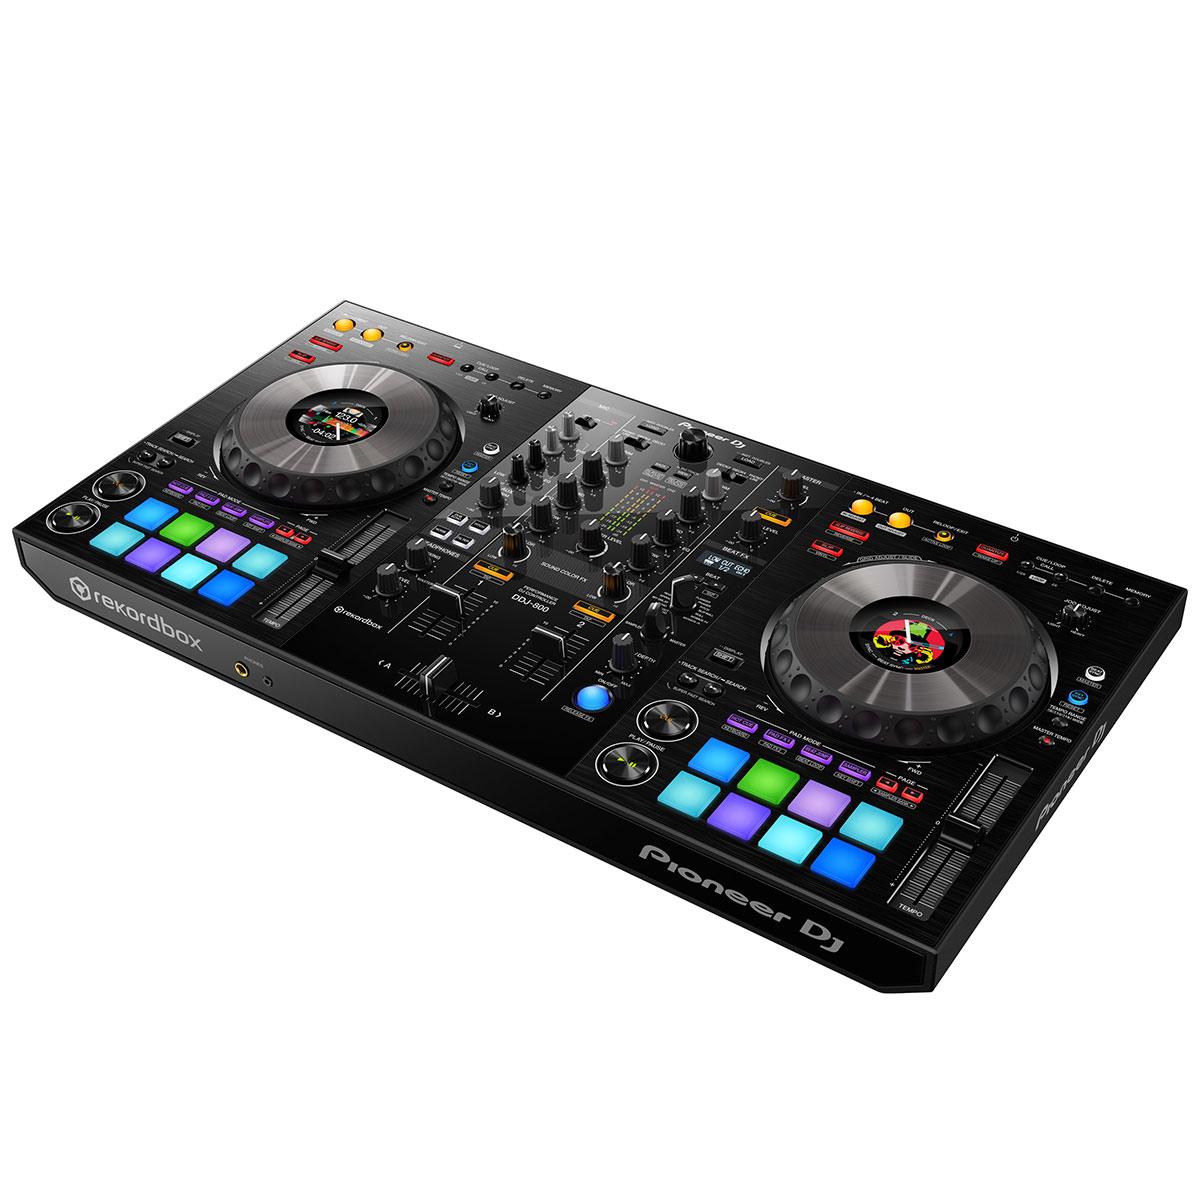 DJ機器, DJコントローラー  DJ Pioneer DJ DDJ-800 DJ